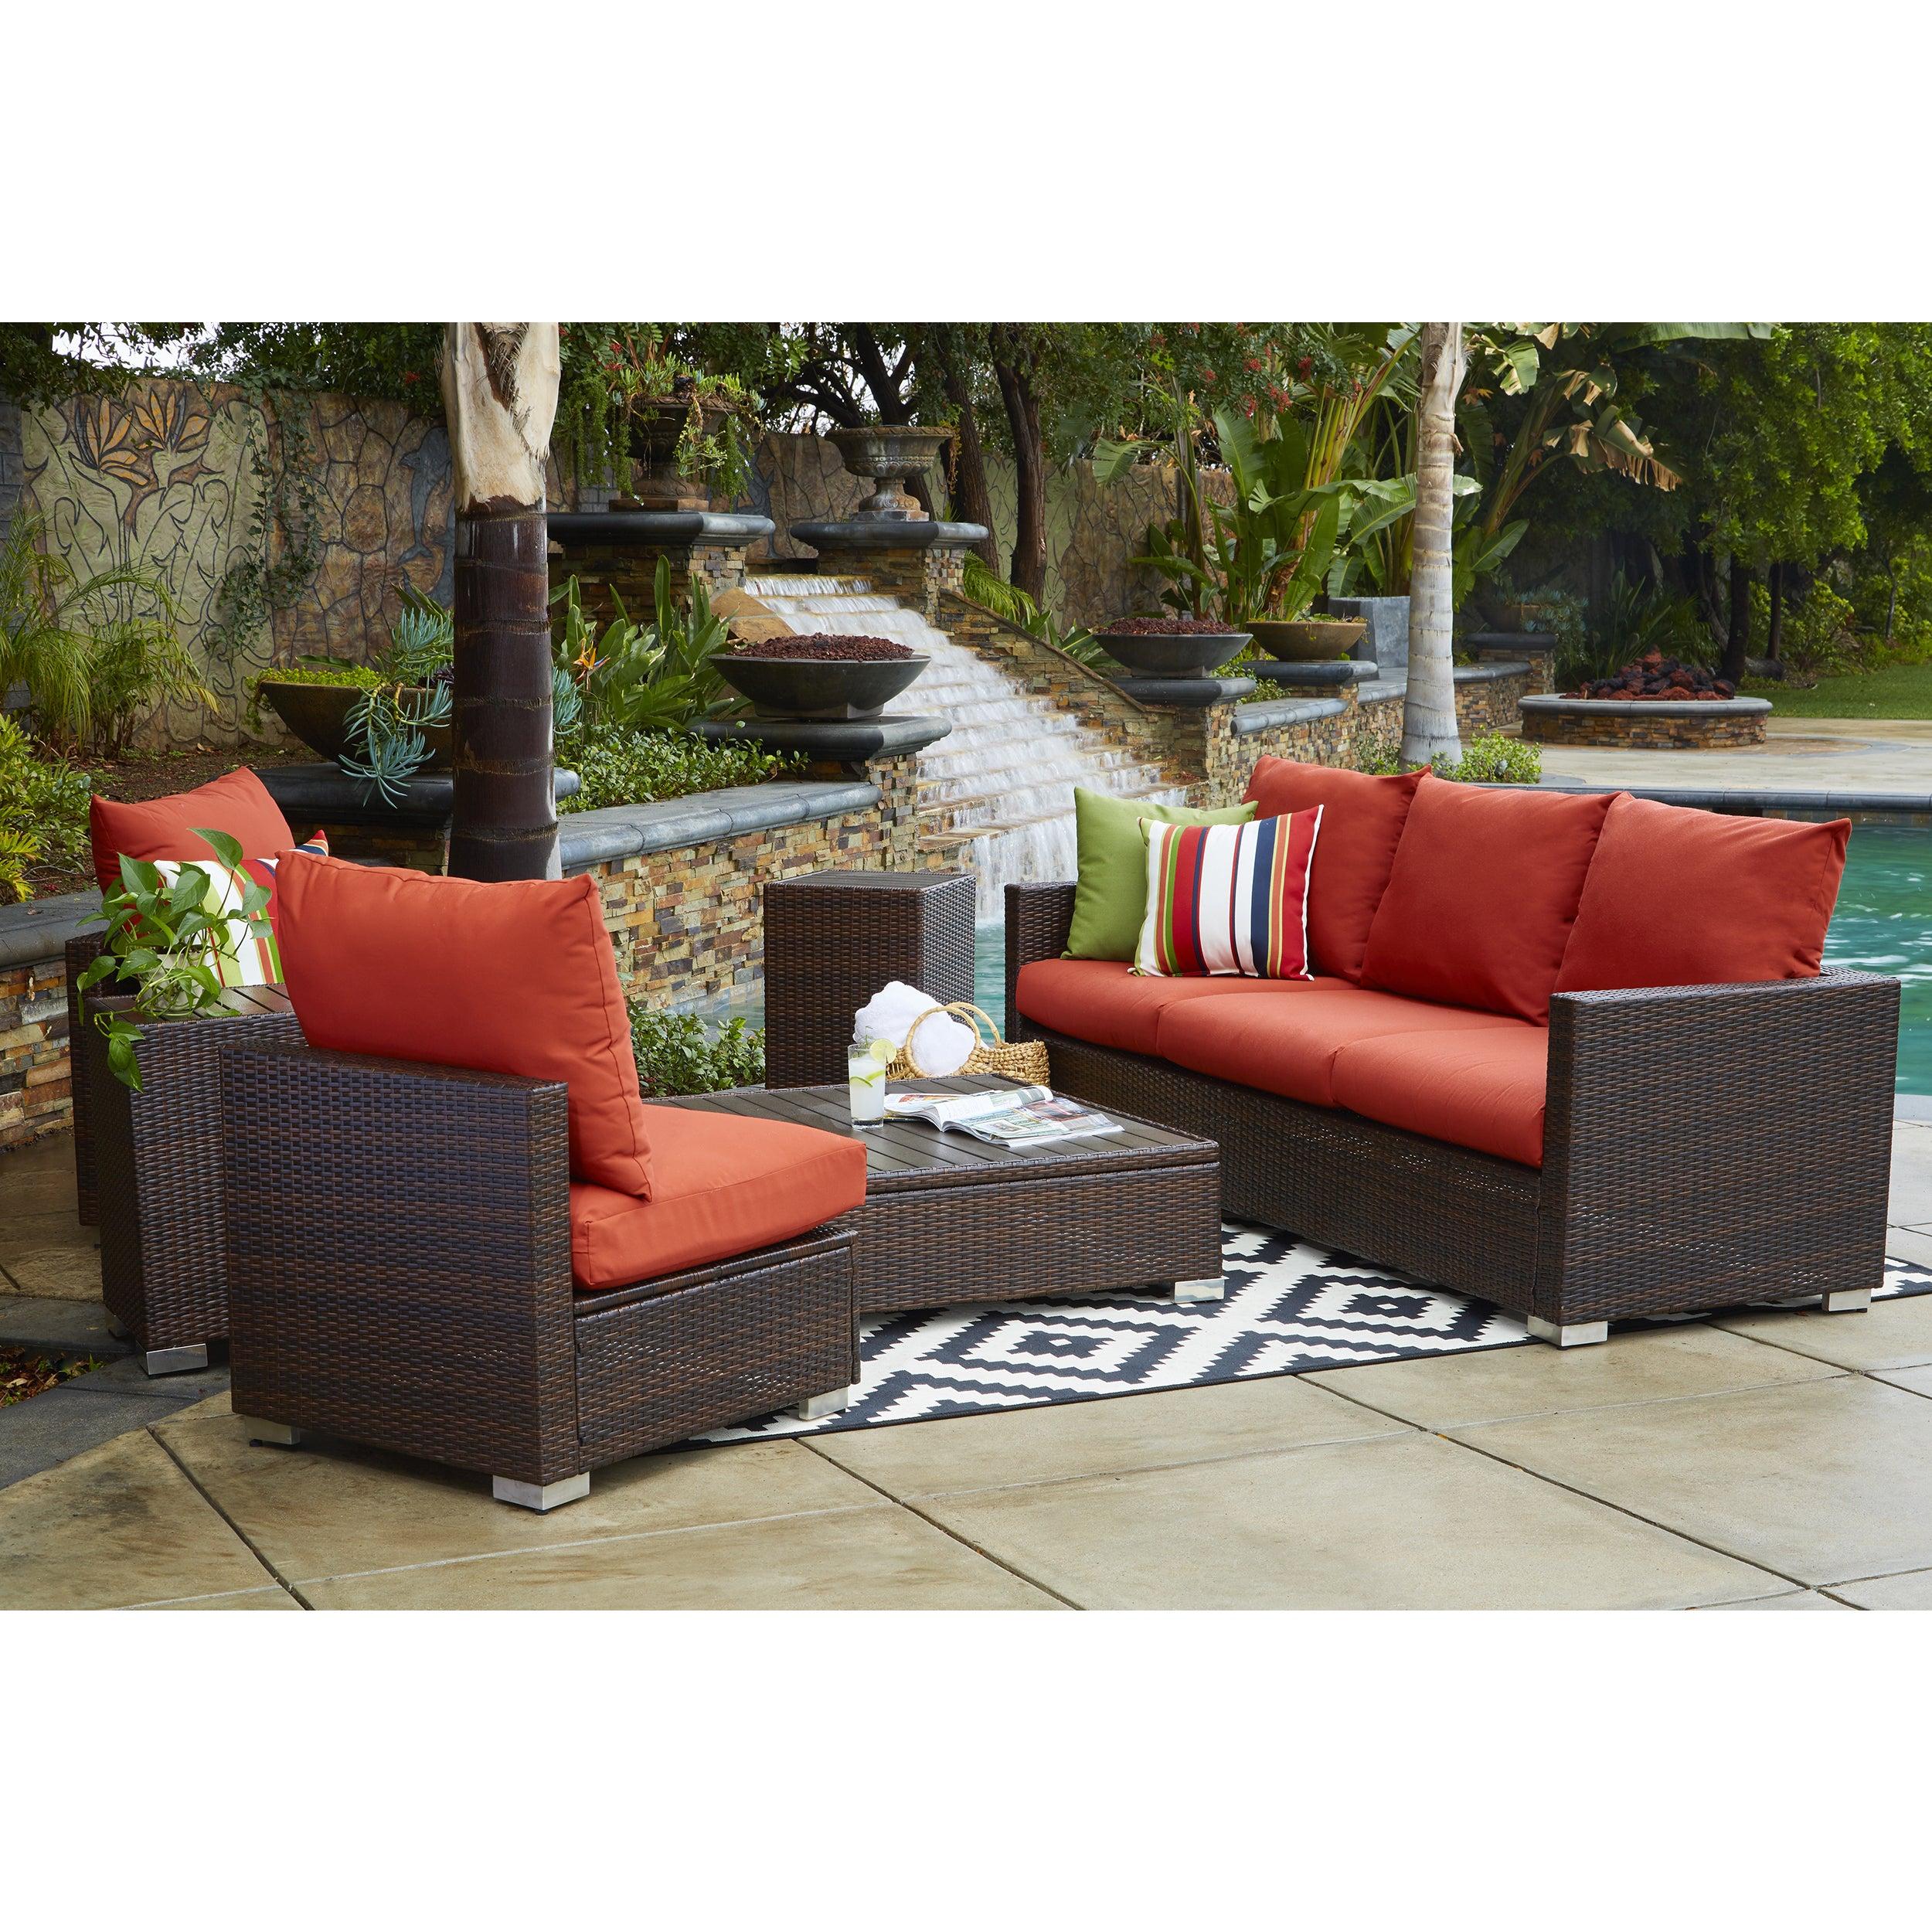 Handy Living Aldrich Indoor/ Outdoor 3 Piece Sofa Set With Sunbrella  Terracotta Cushions